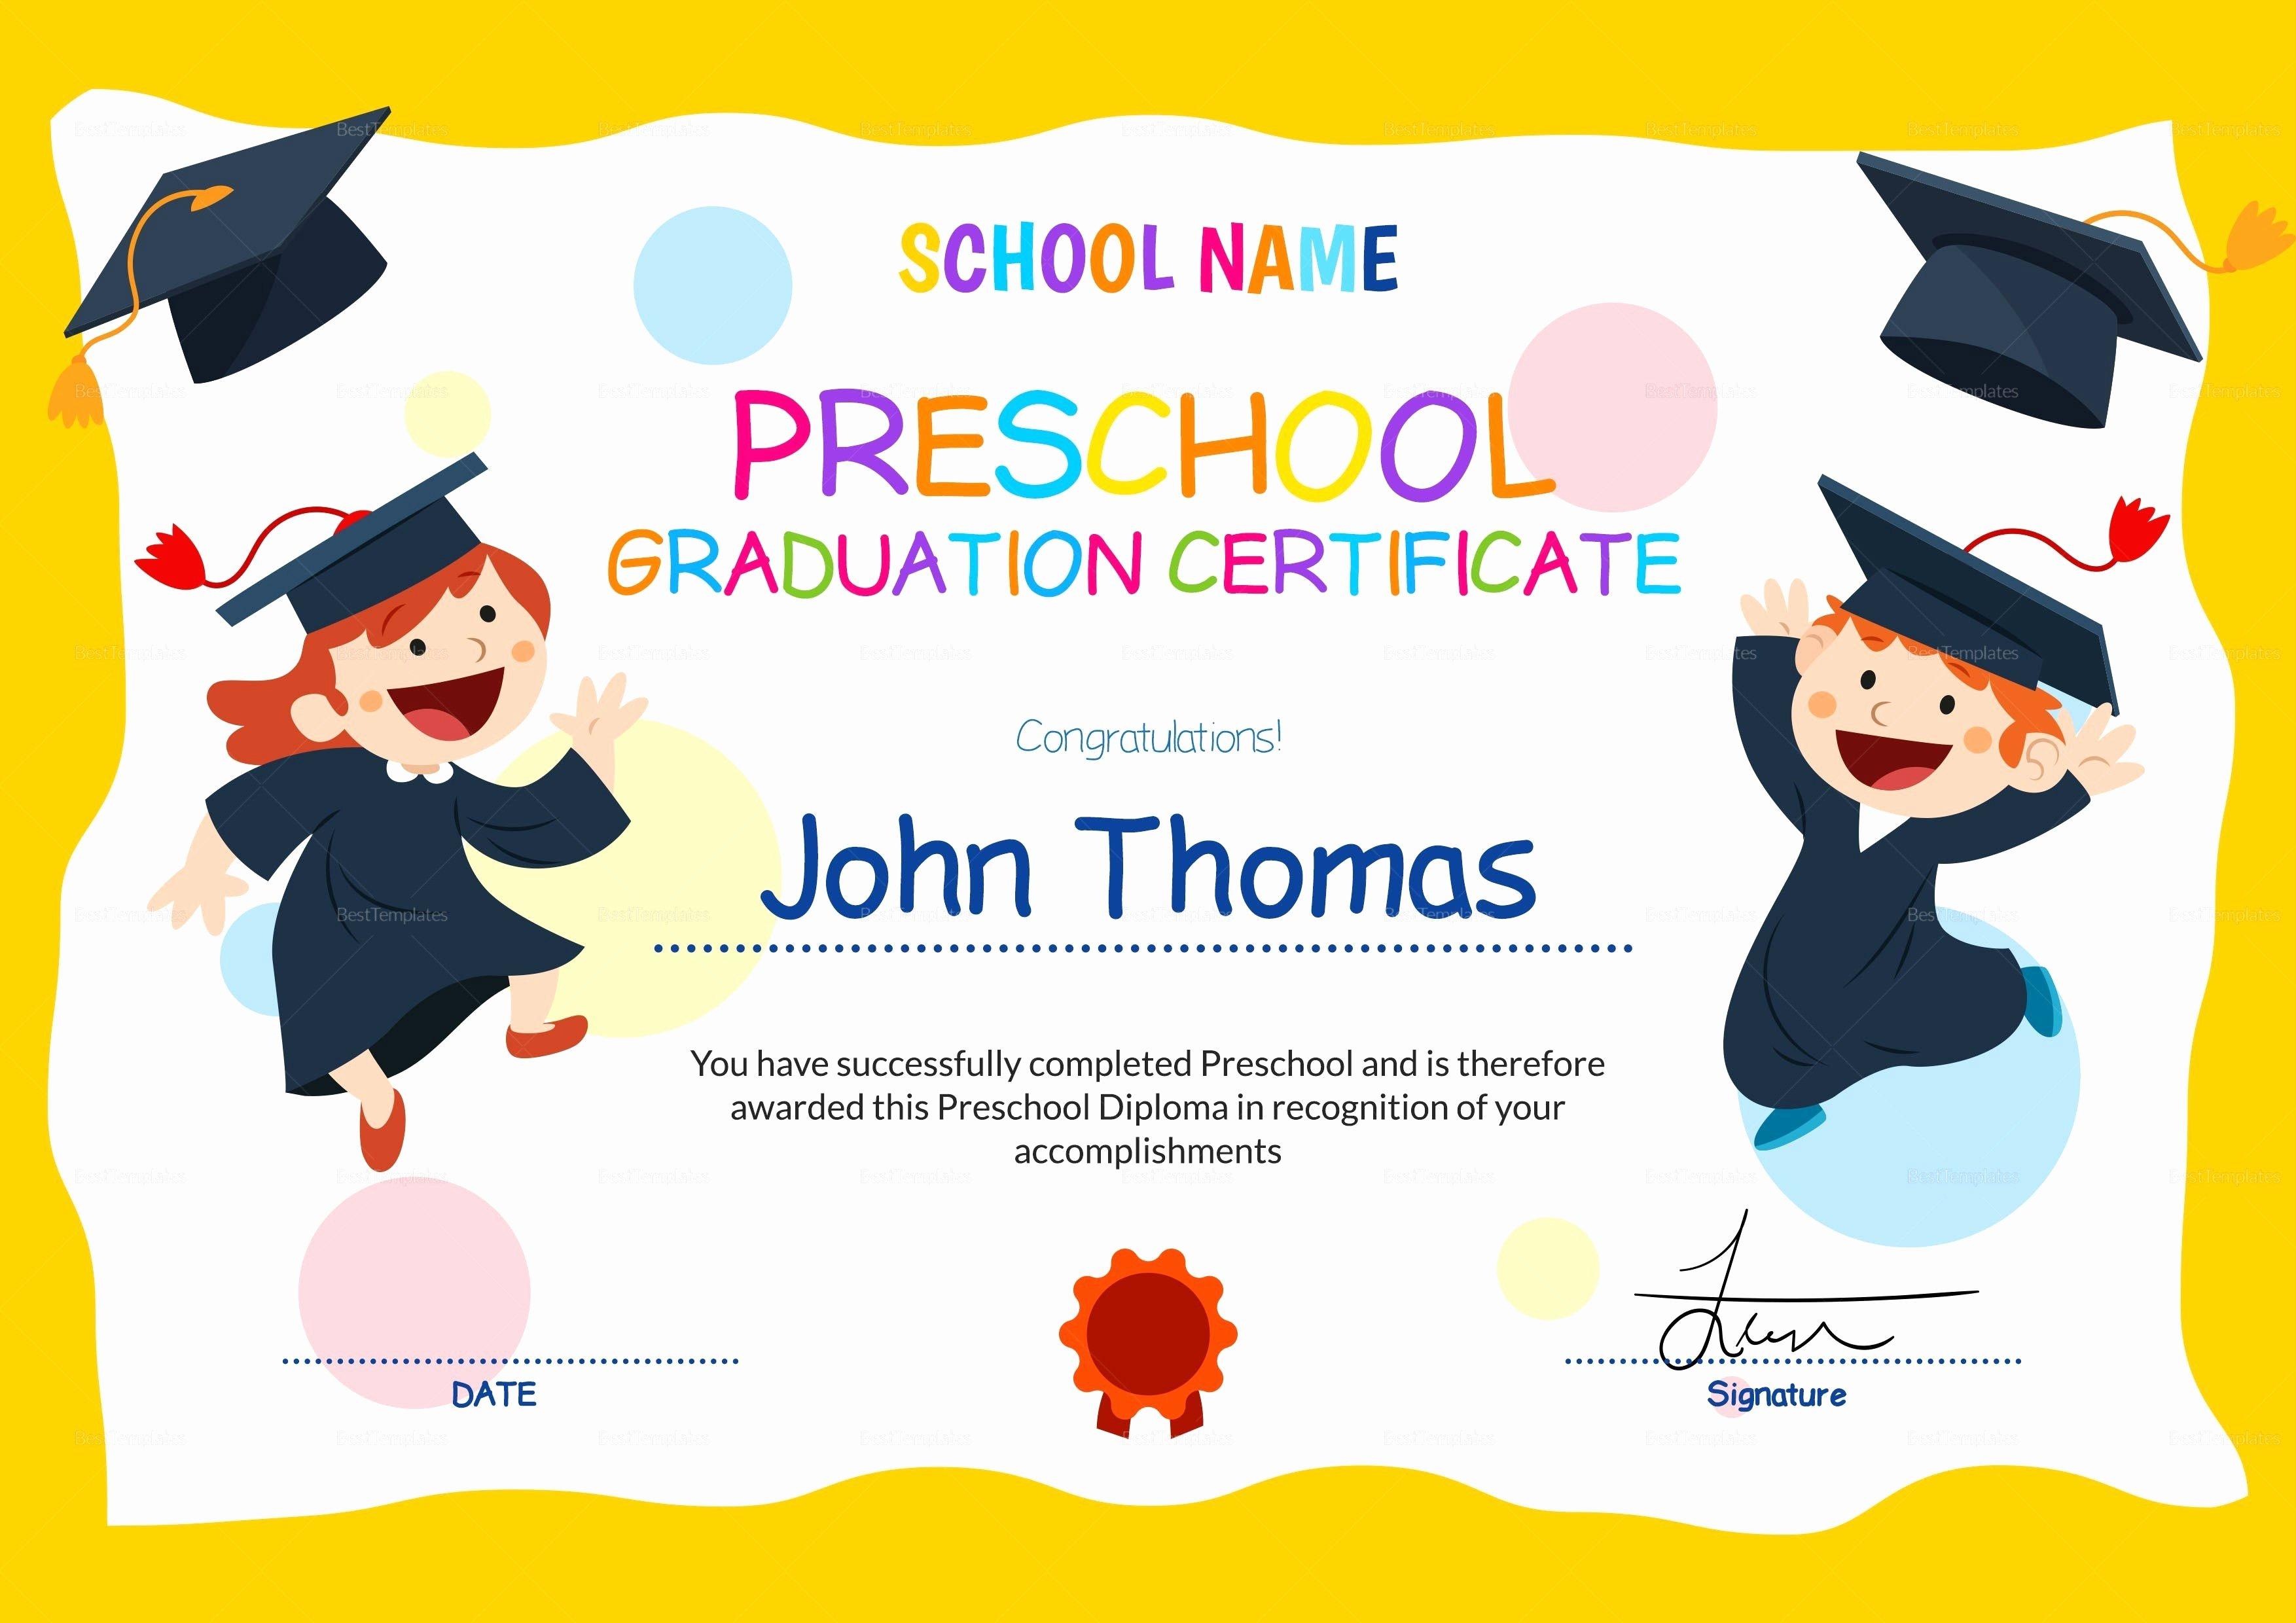 Preschool Graduation Programs Template Luxury 11 Preschool Certificate Templates Pdf